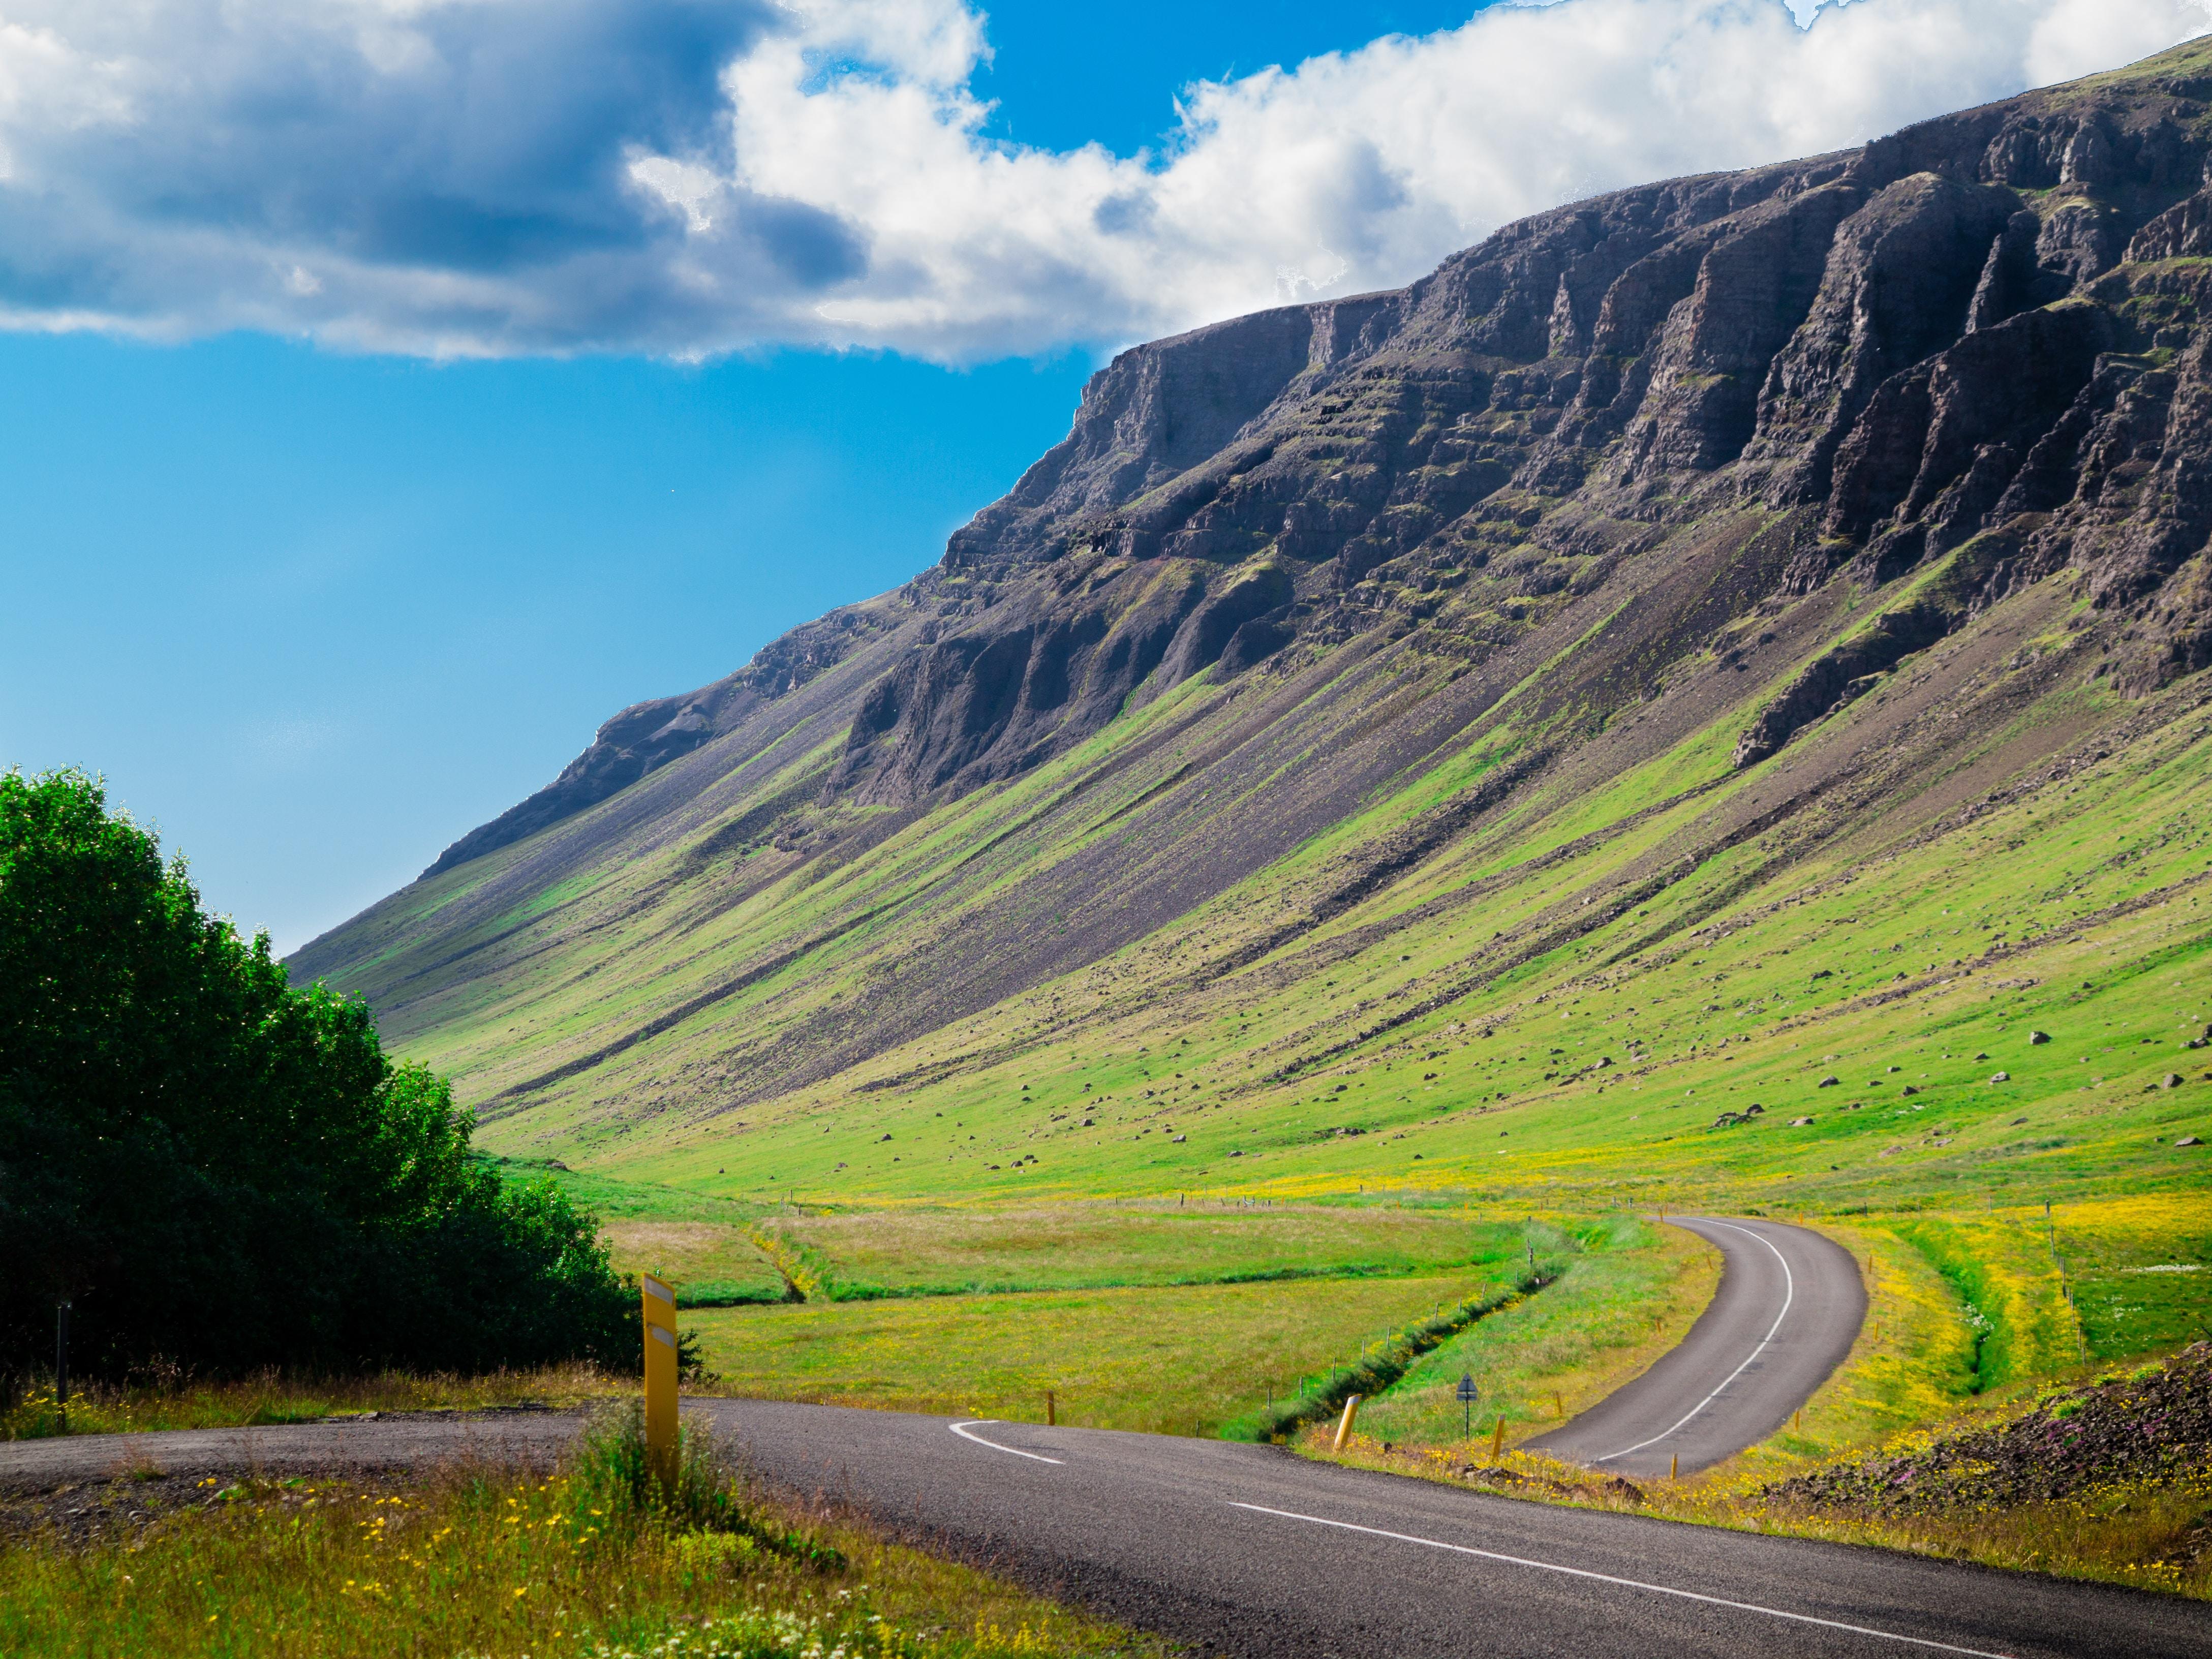 landscape photo of mountain under blue sky